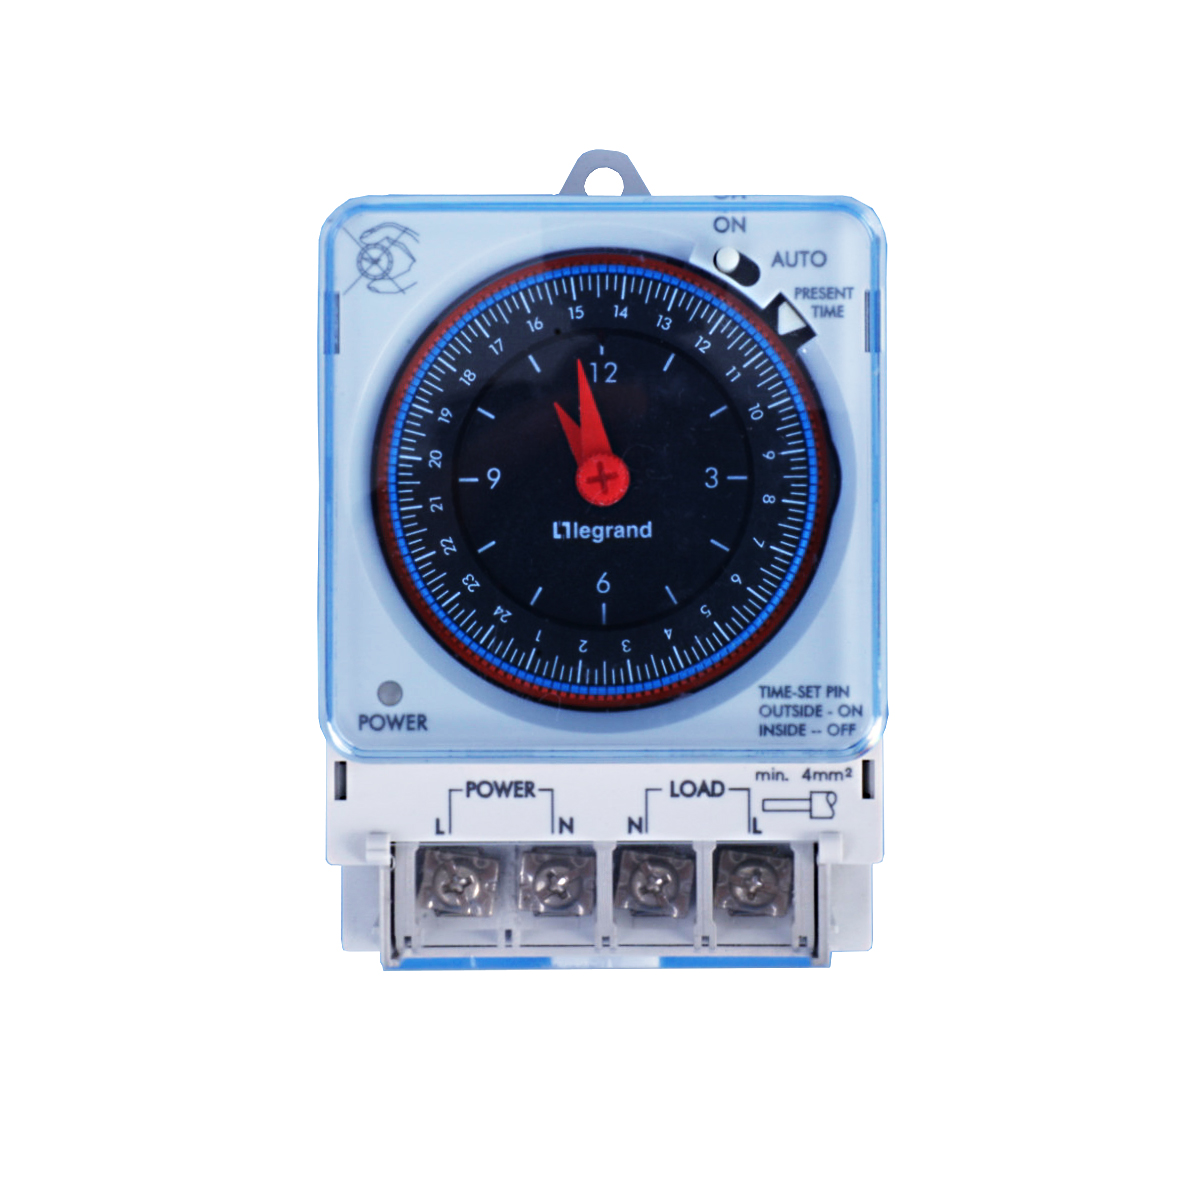 LEGRAND MaxiRex นาฬิกาตั้งเวลาแบบโปรแกรมได้